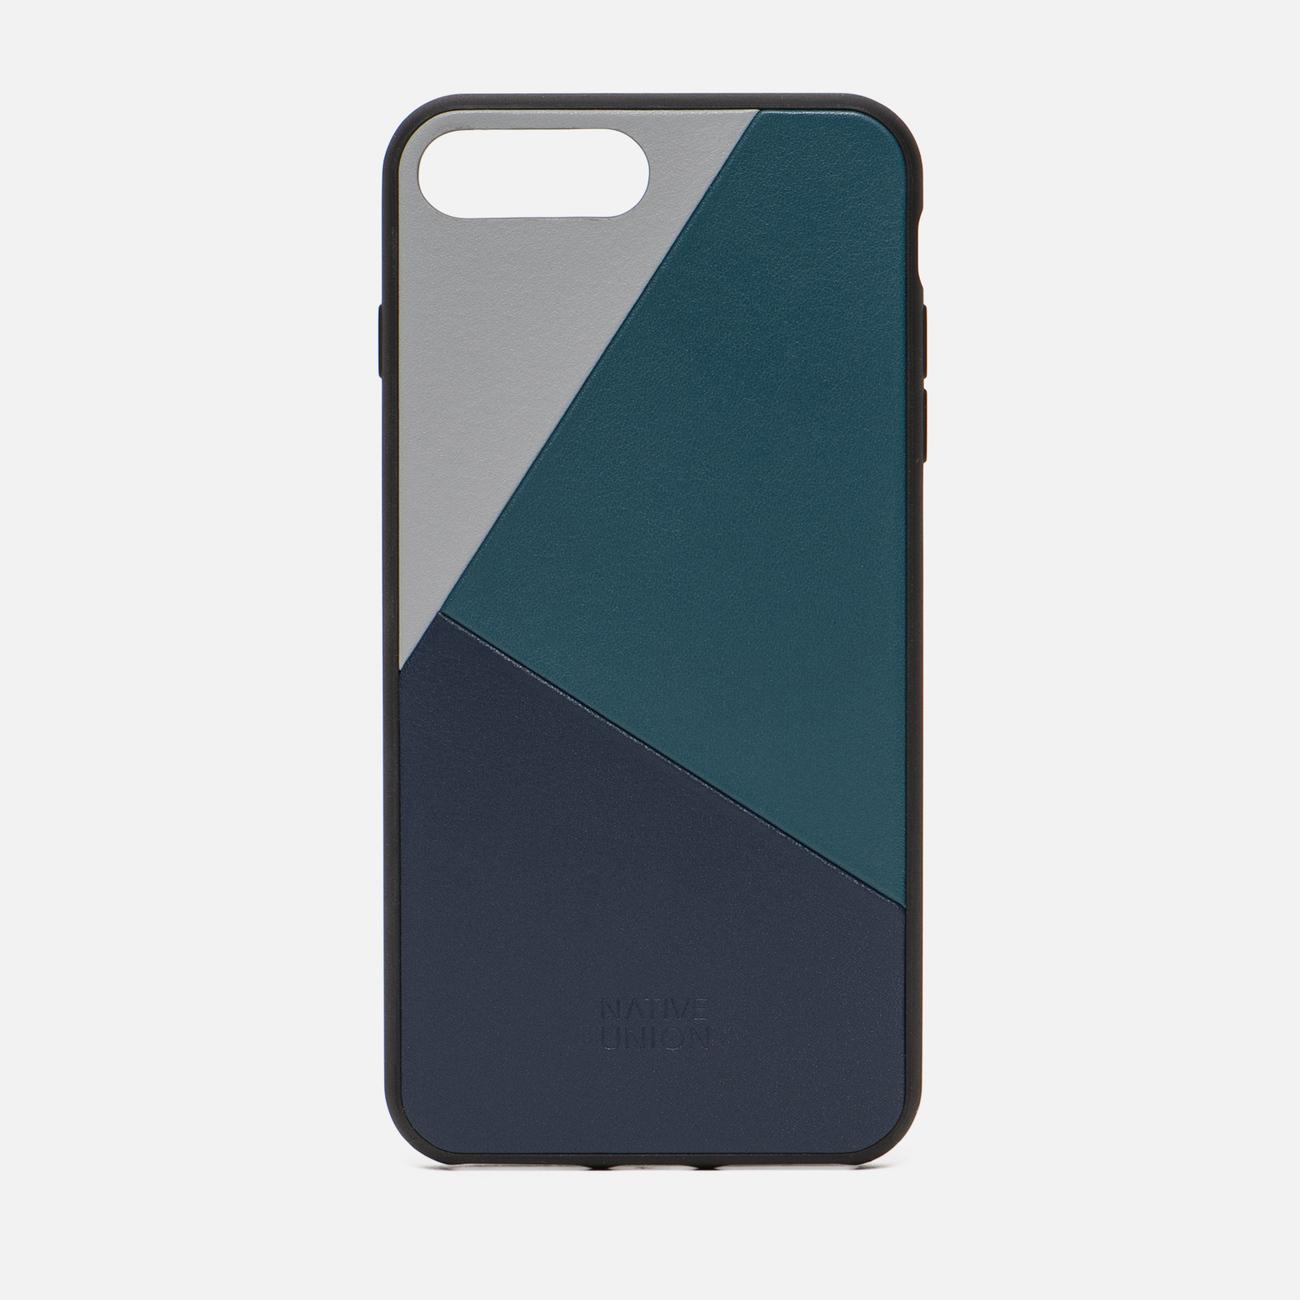 Чехол Native Union Clic Marquetry iPhone 7/8 Plus Grey/Dark Green/Dark Blue